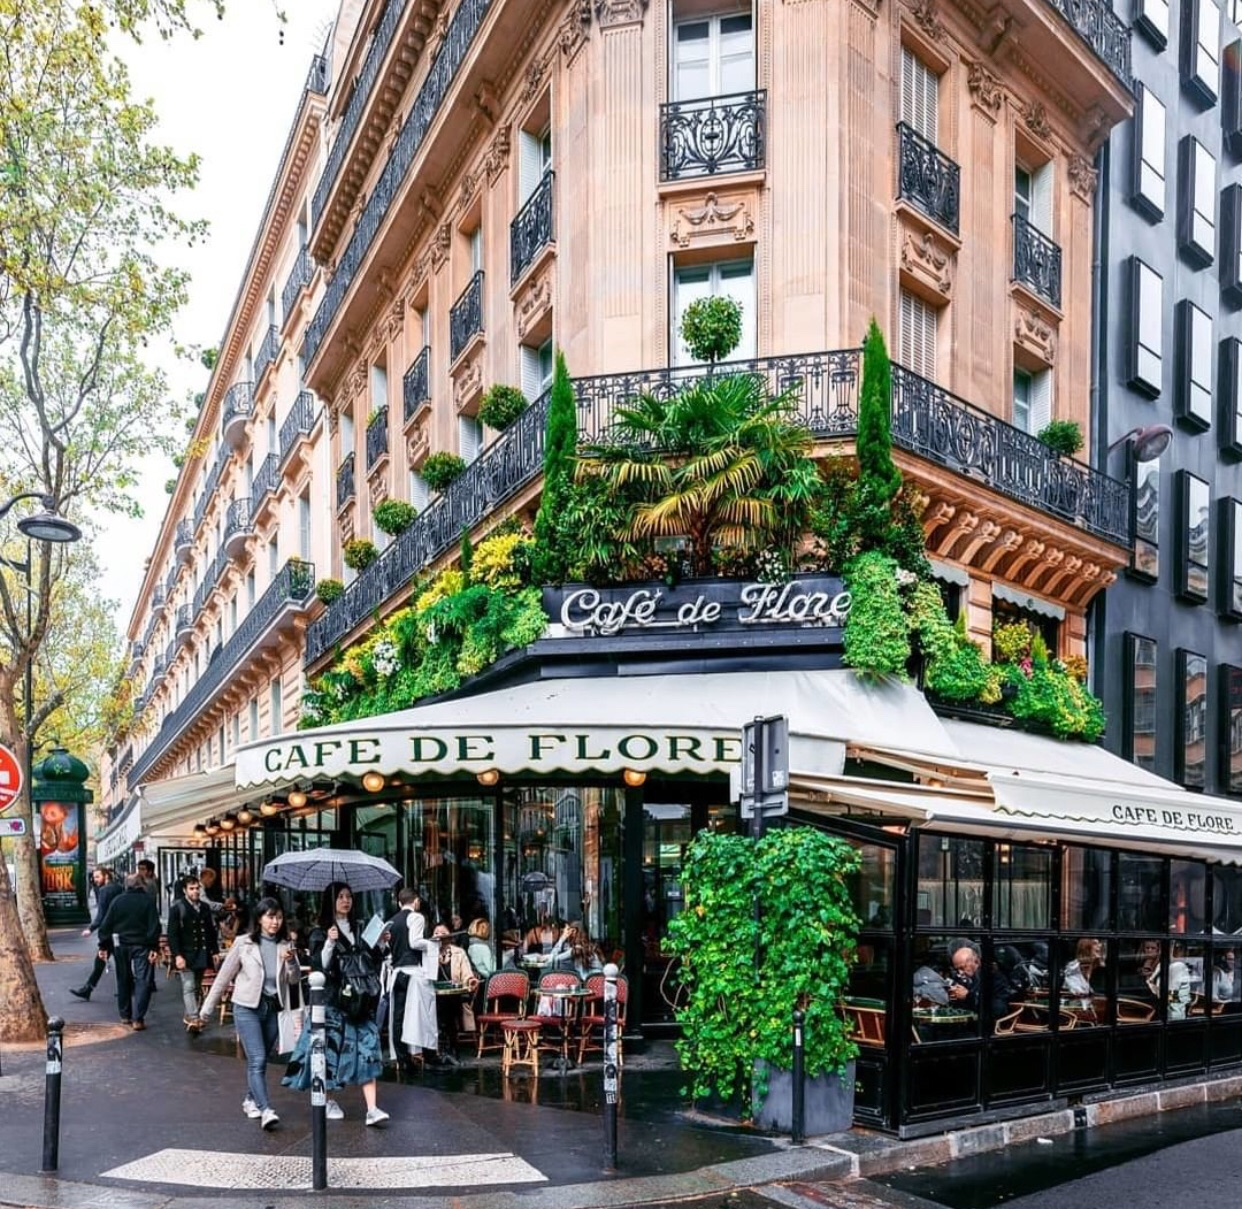 architecture, cafe, and cafe de flore image